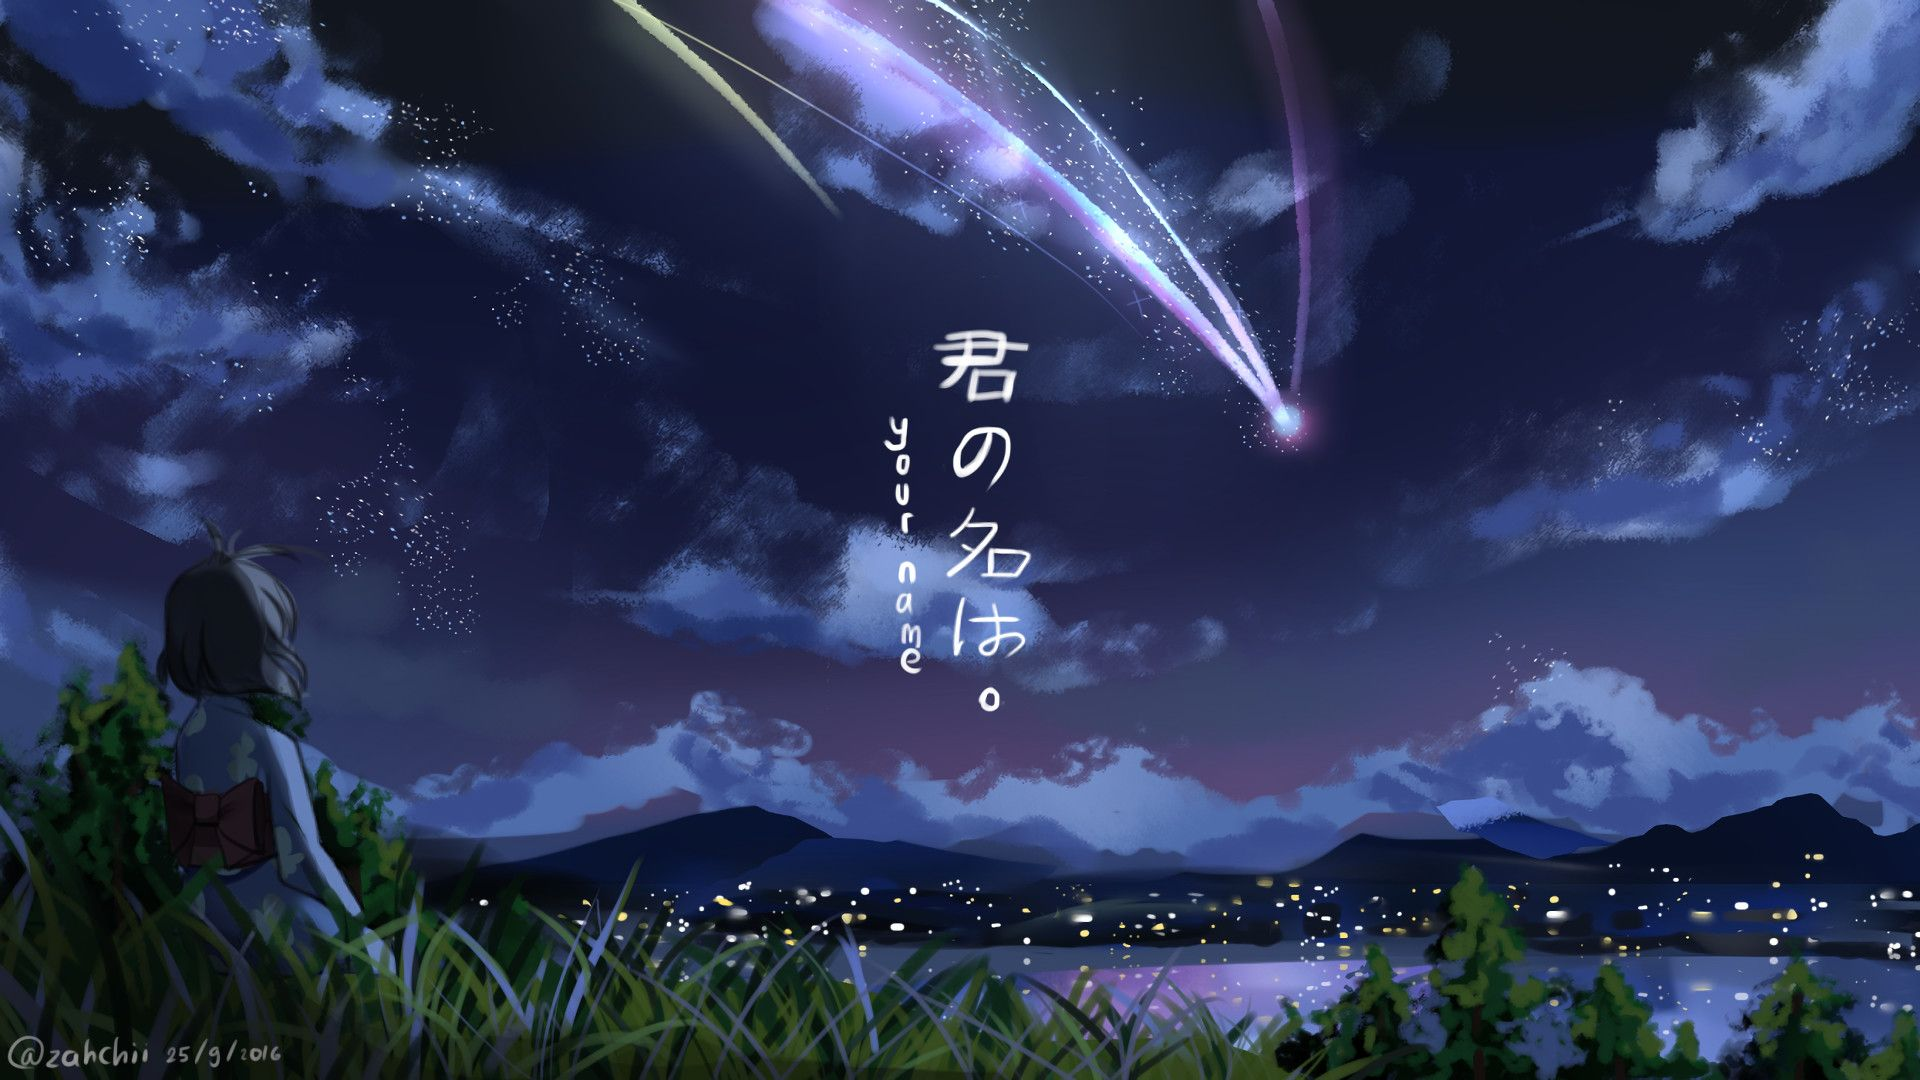 1920x1080 Anime Your Name Mitsuha Miyamizu Kimi No Na Wa Wallpaper Your Name Wallpaper Kimi No Na Wa Kimi No Na Wa Wallpaper